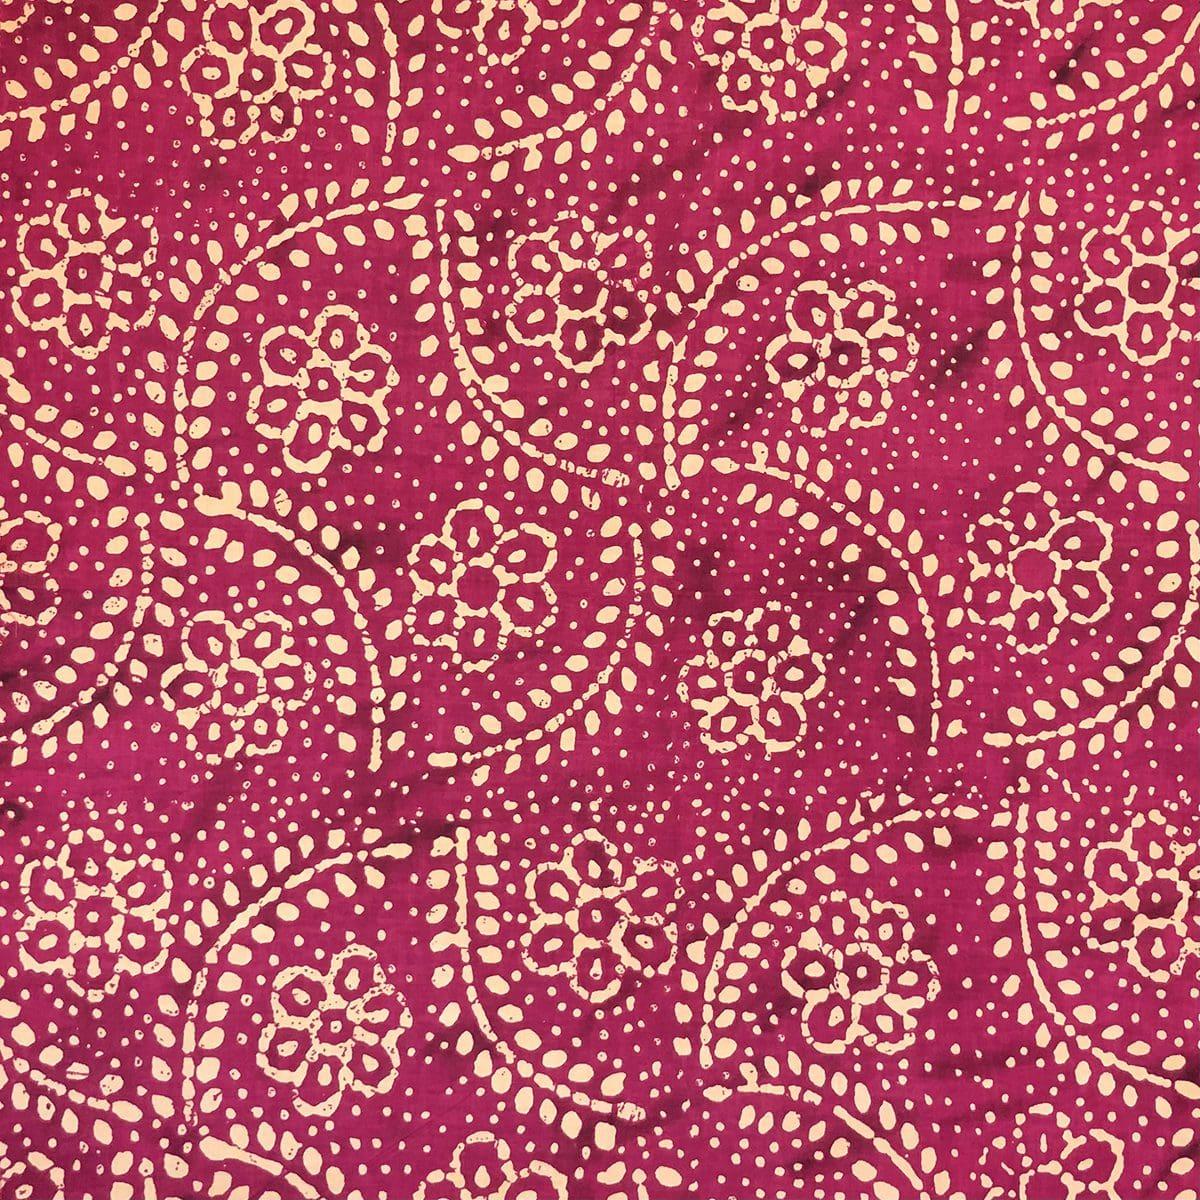 B22BAT-100089 Batik Pink